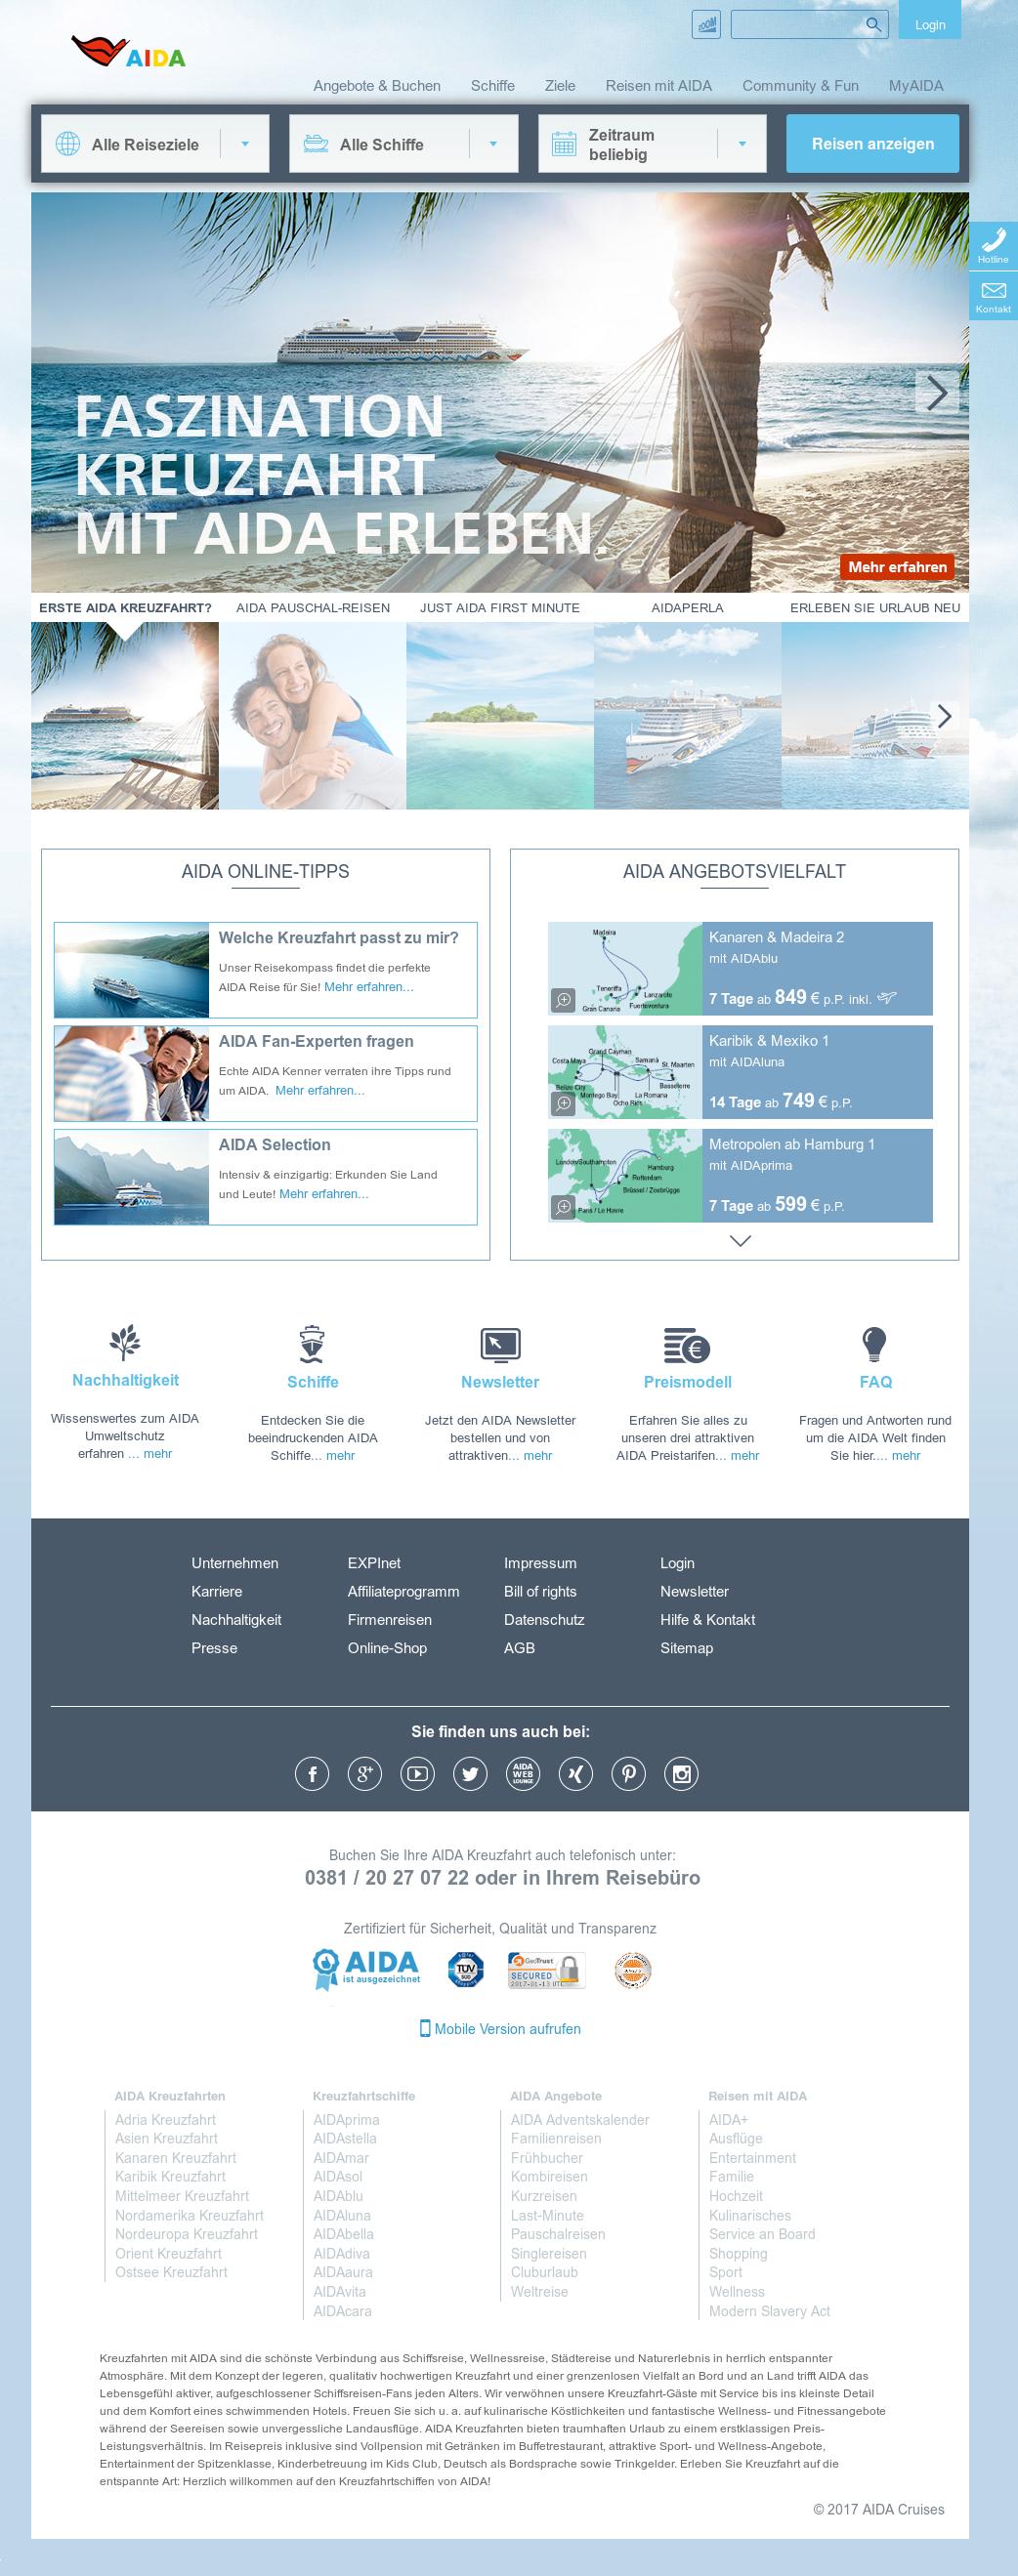 Aida Weihnachtskalender.Aida Cruises Competitors Revenue And Employees Owler Company Profile